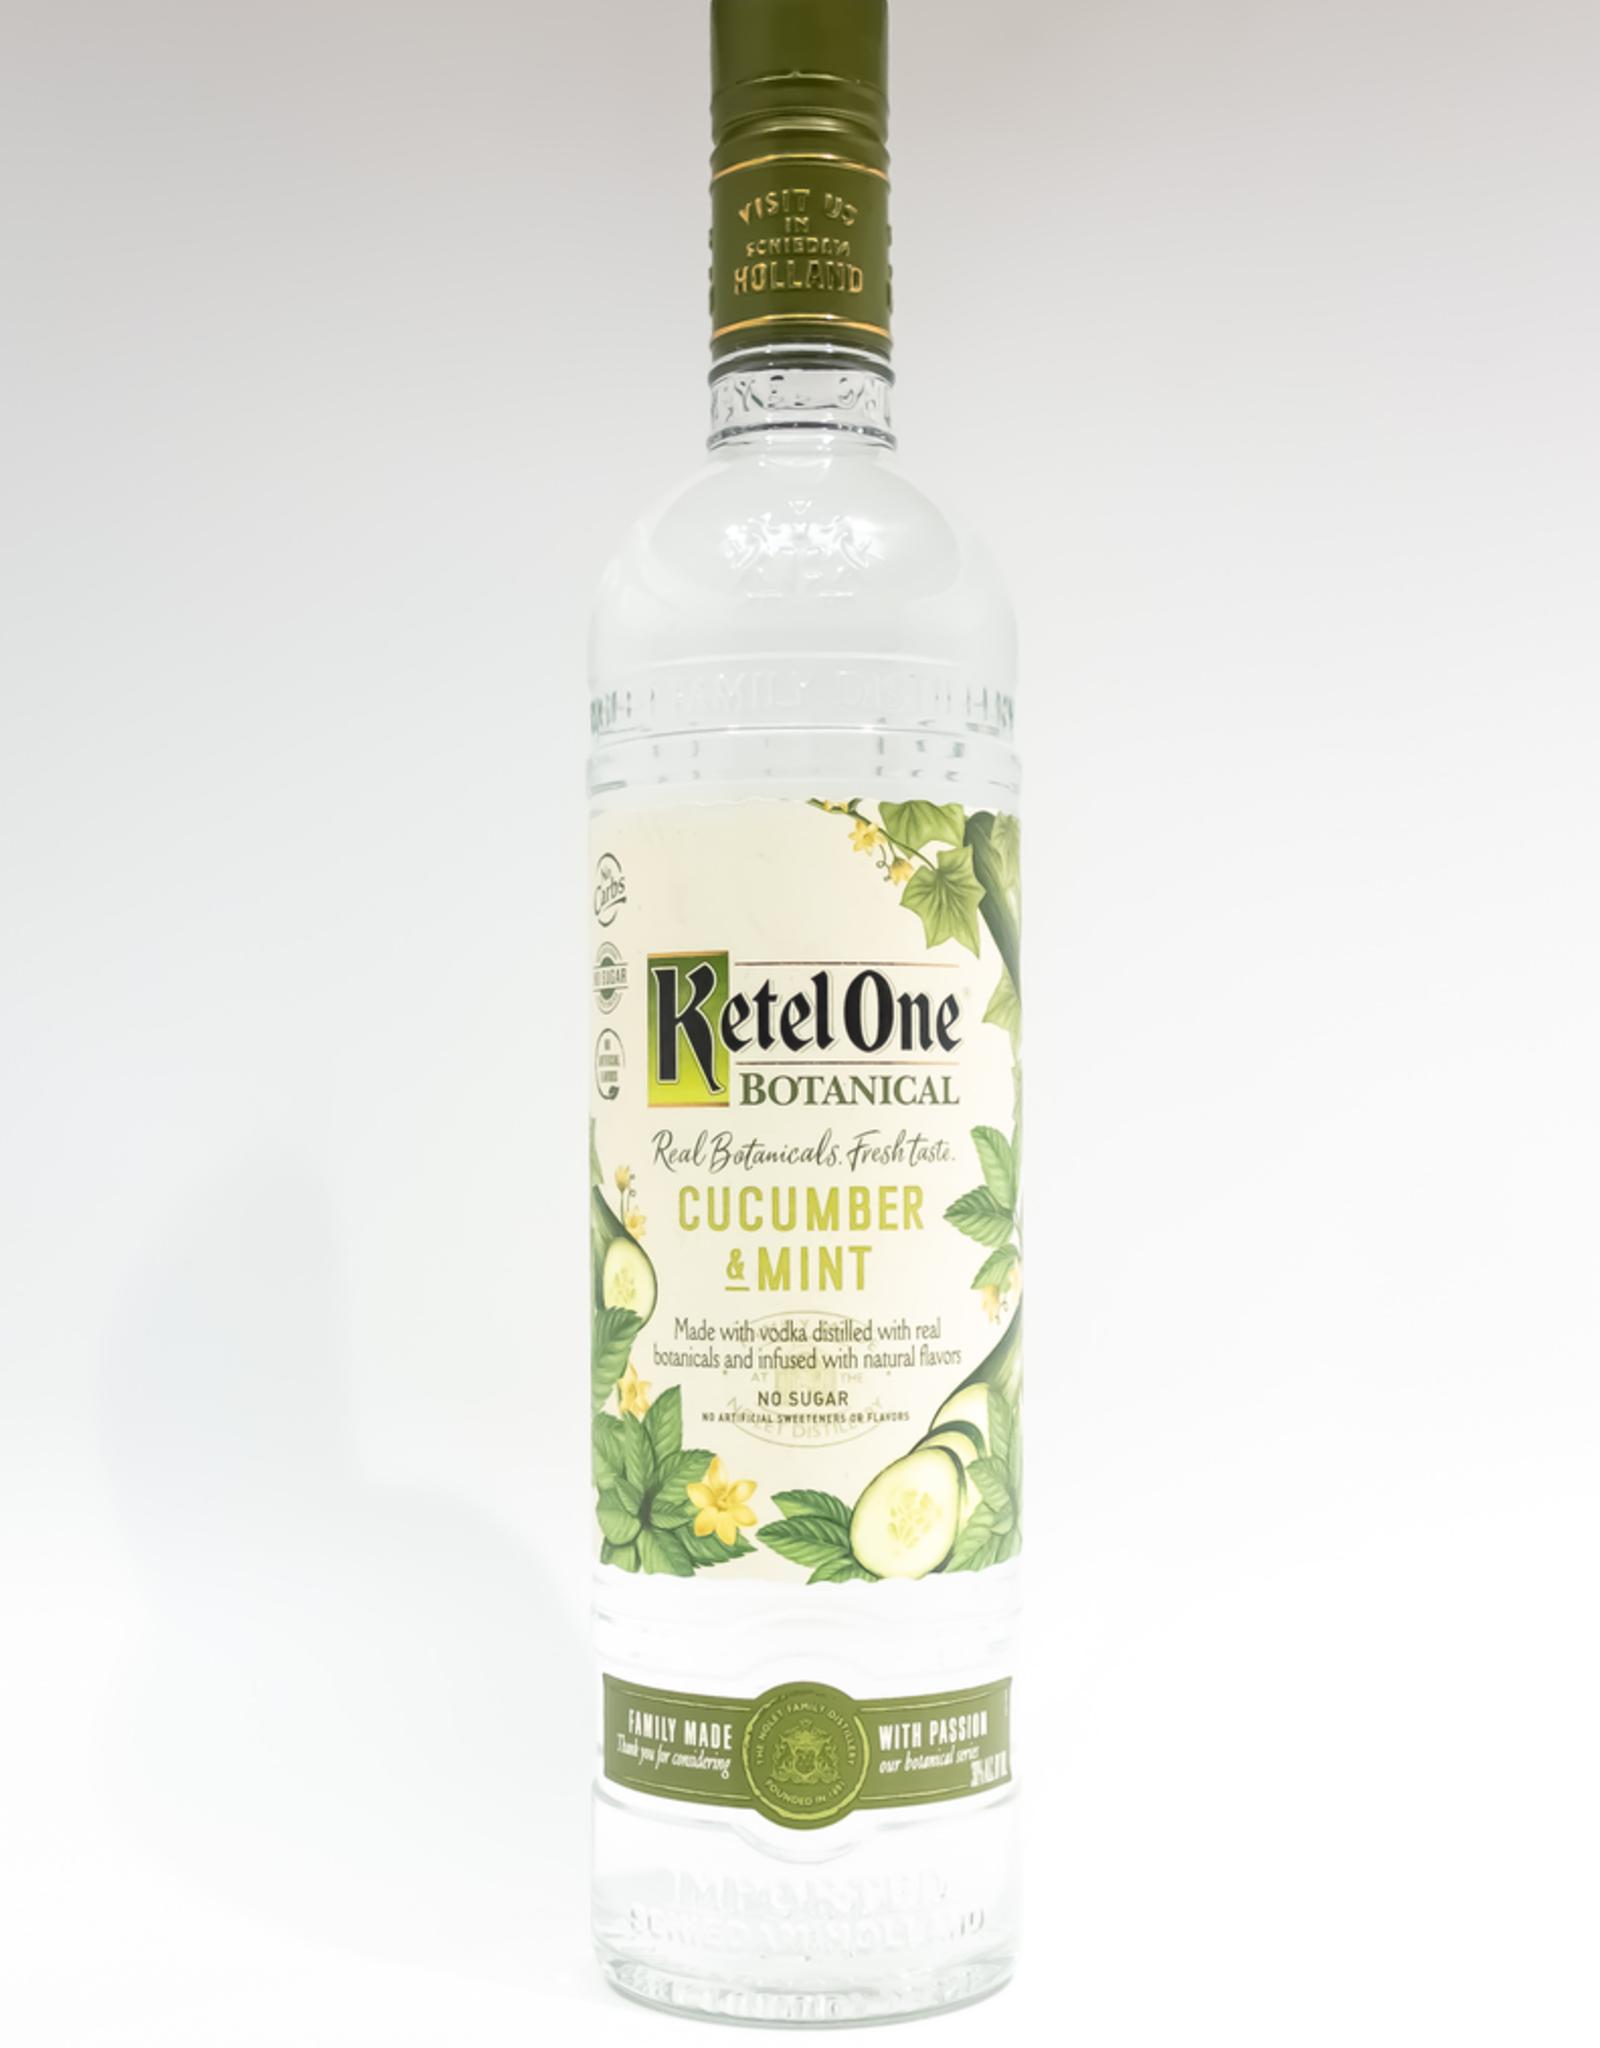 Spirits-Vodka Ketel One Botanical Cucumber Mint Vodka 750ml